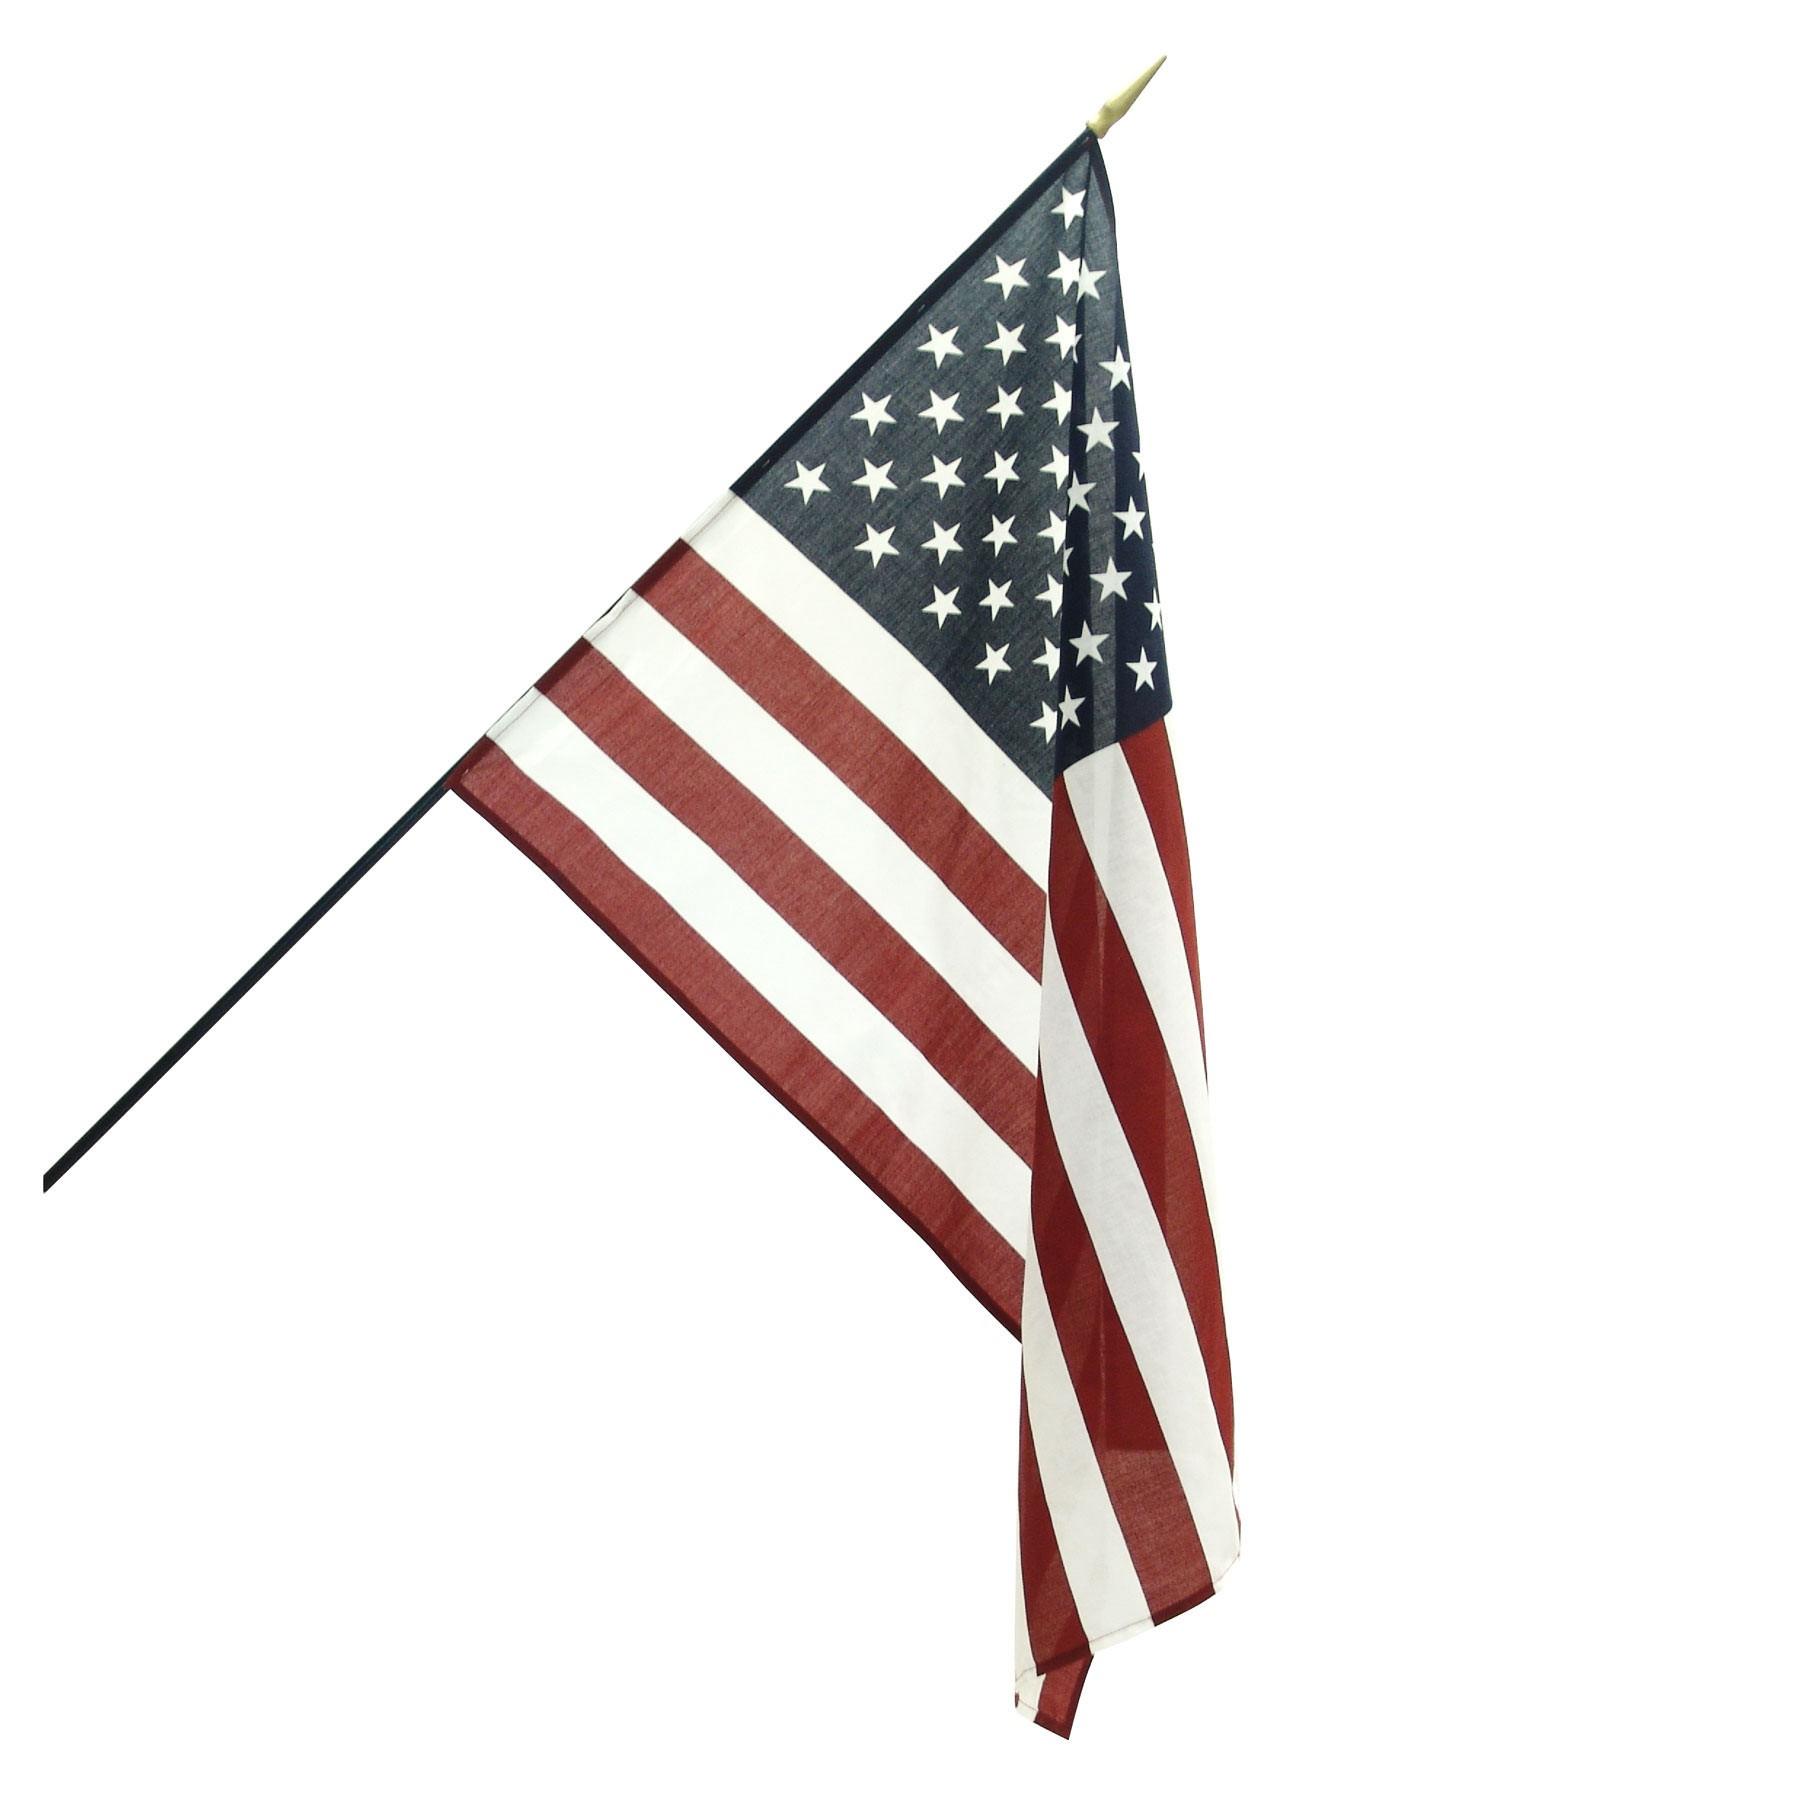 1800x1800 Clipart Standard Flags